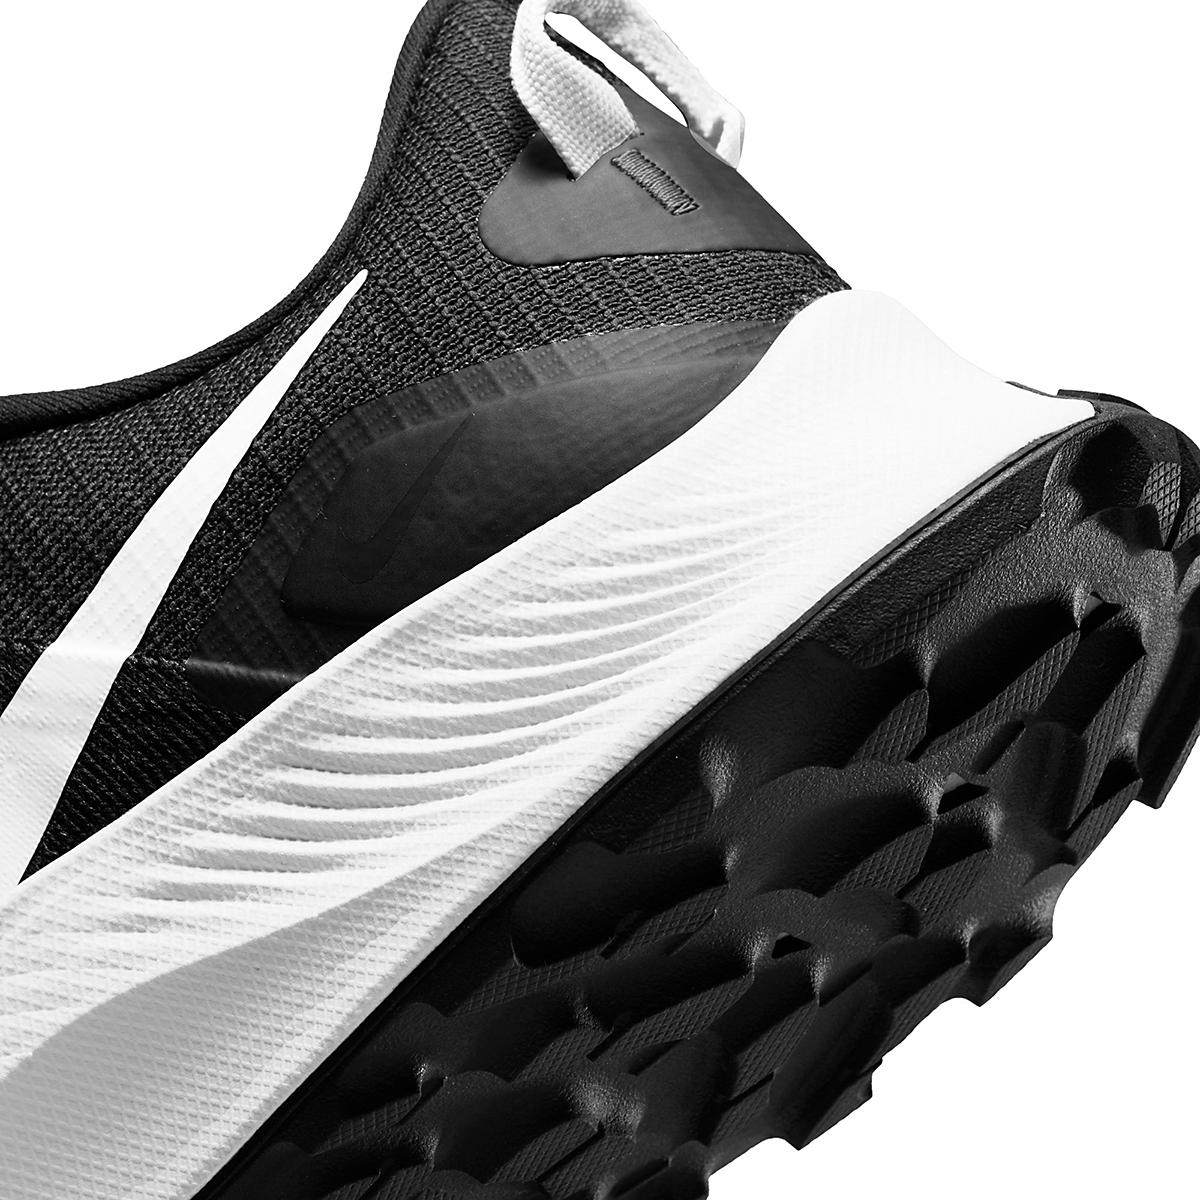 Men's Nike Pegasus Trail 3 Trail Running Shoe  - Color: Black/Pure Platinum/Dark Smoke Grey  - Size: 6 - Width: Regular, Black/Pure Platinum/Dark Smoke Grey, large, image 6